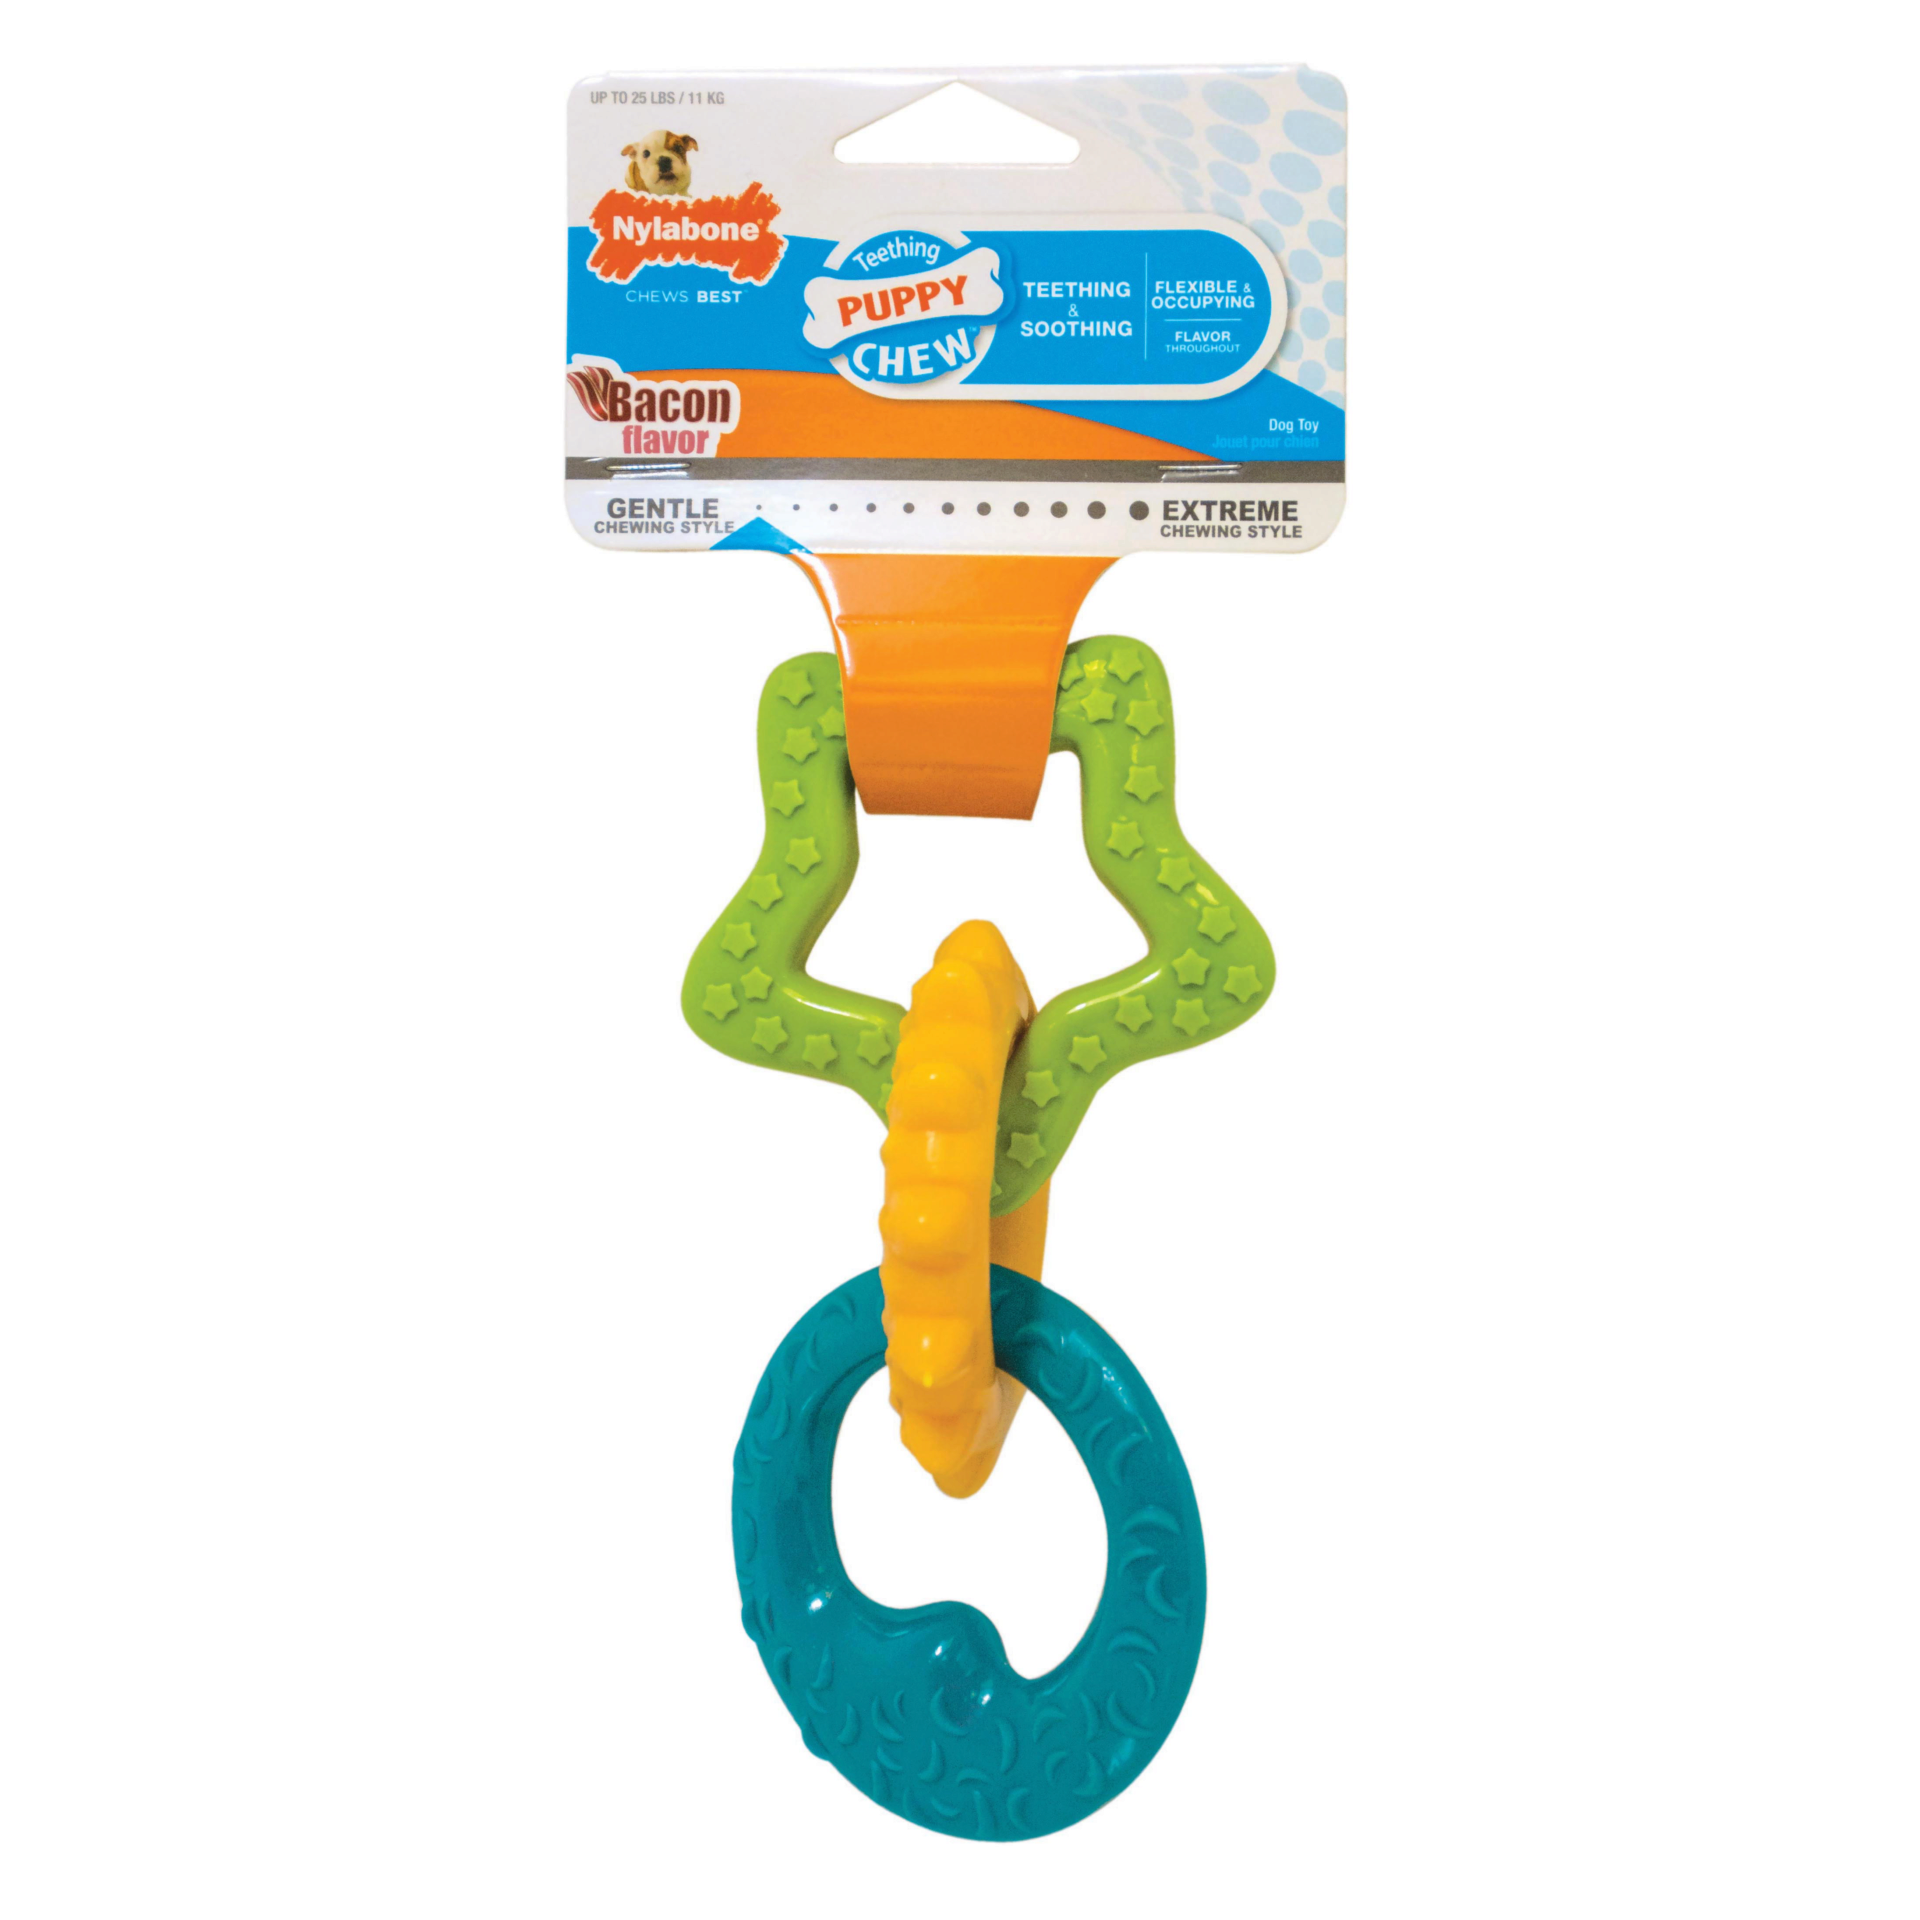 Nylabone Nylabone Puppy Chew Teething Rings Dog Toy